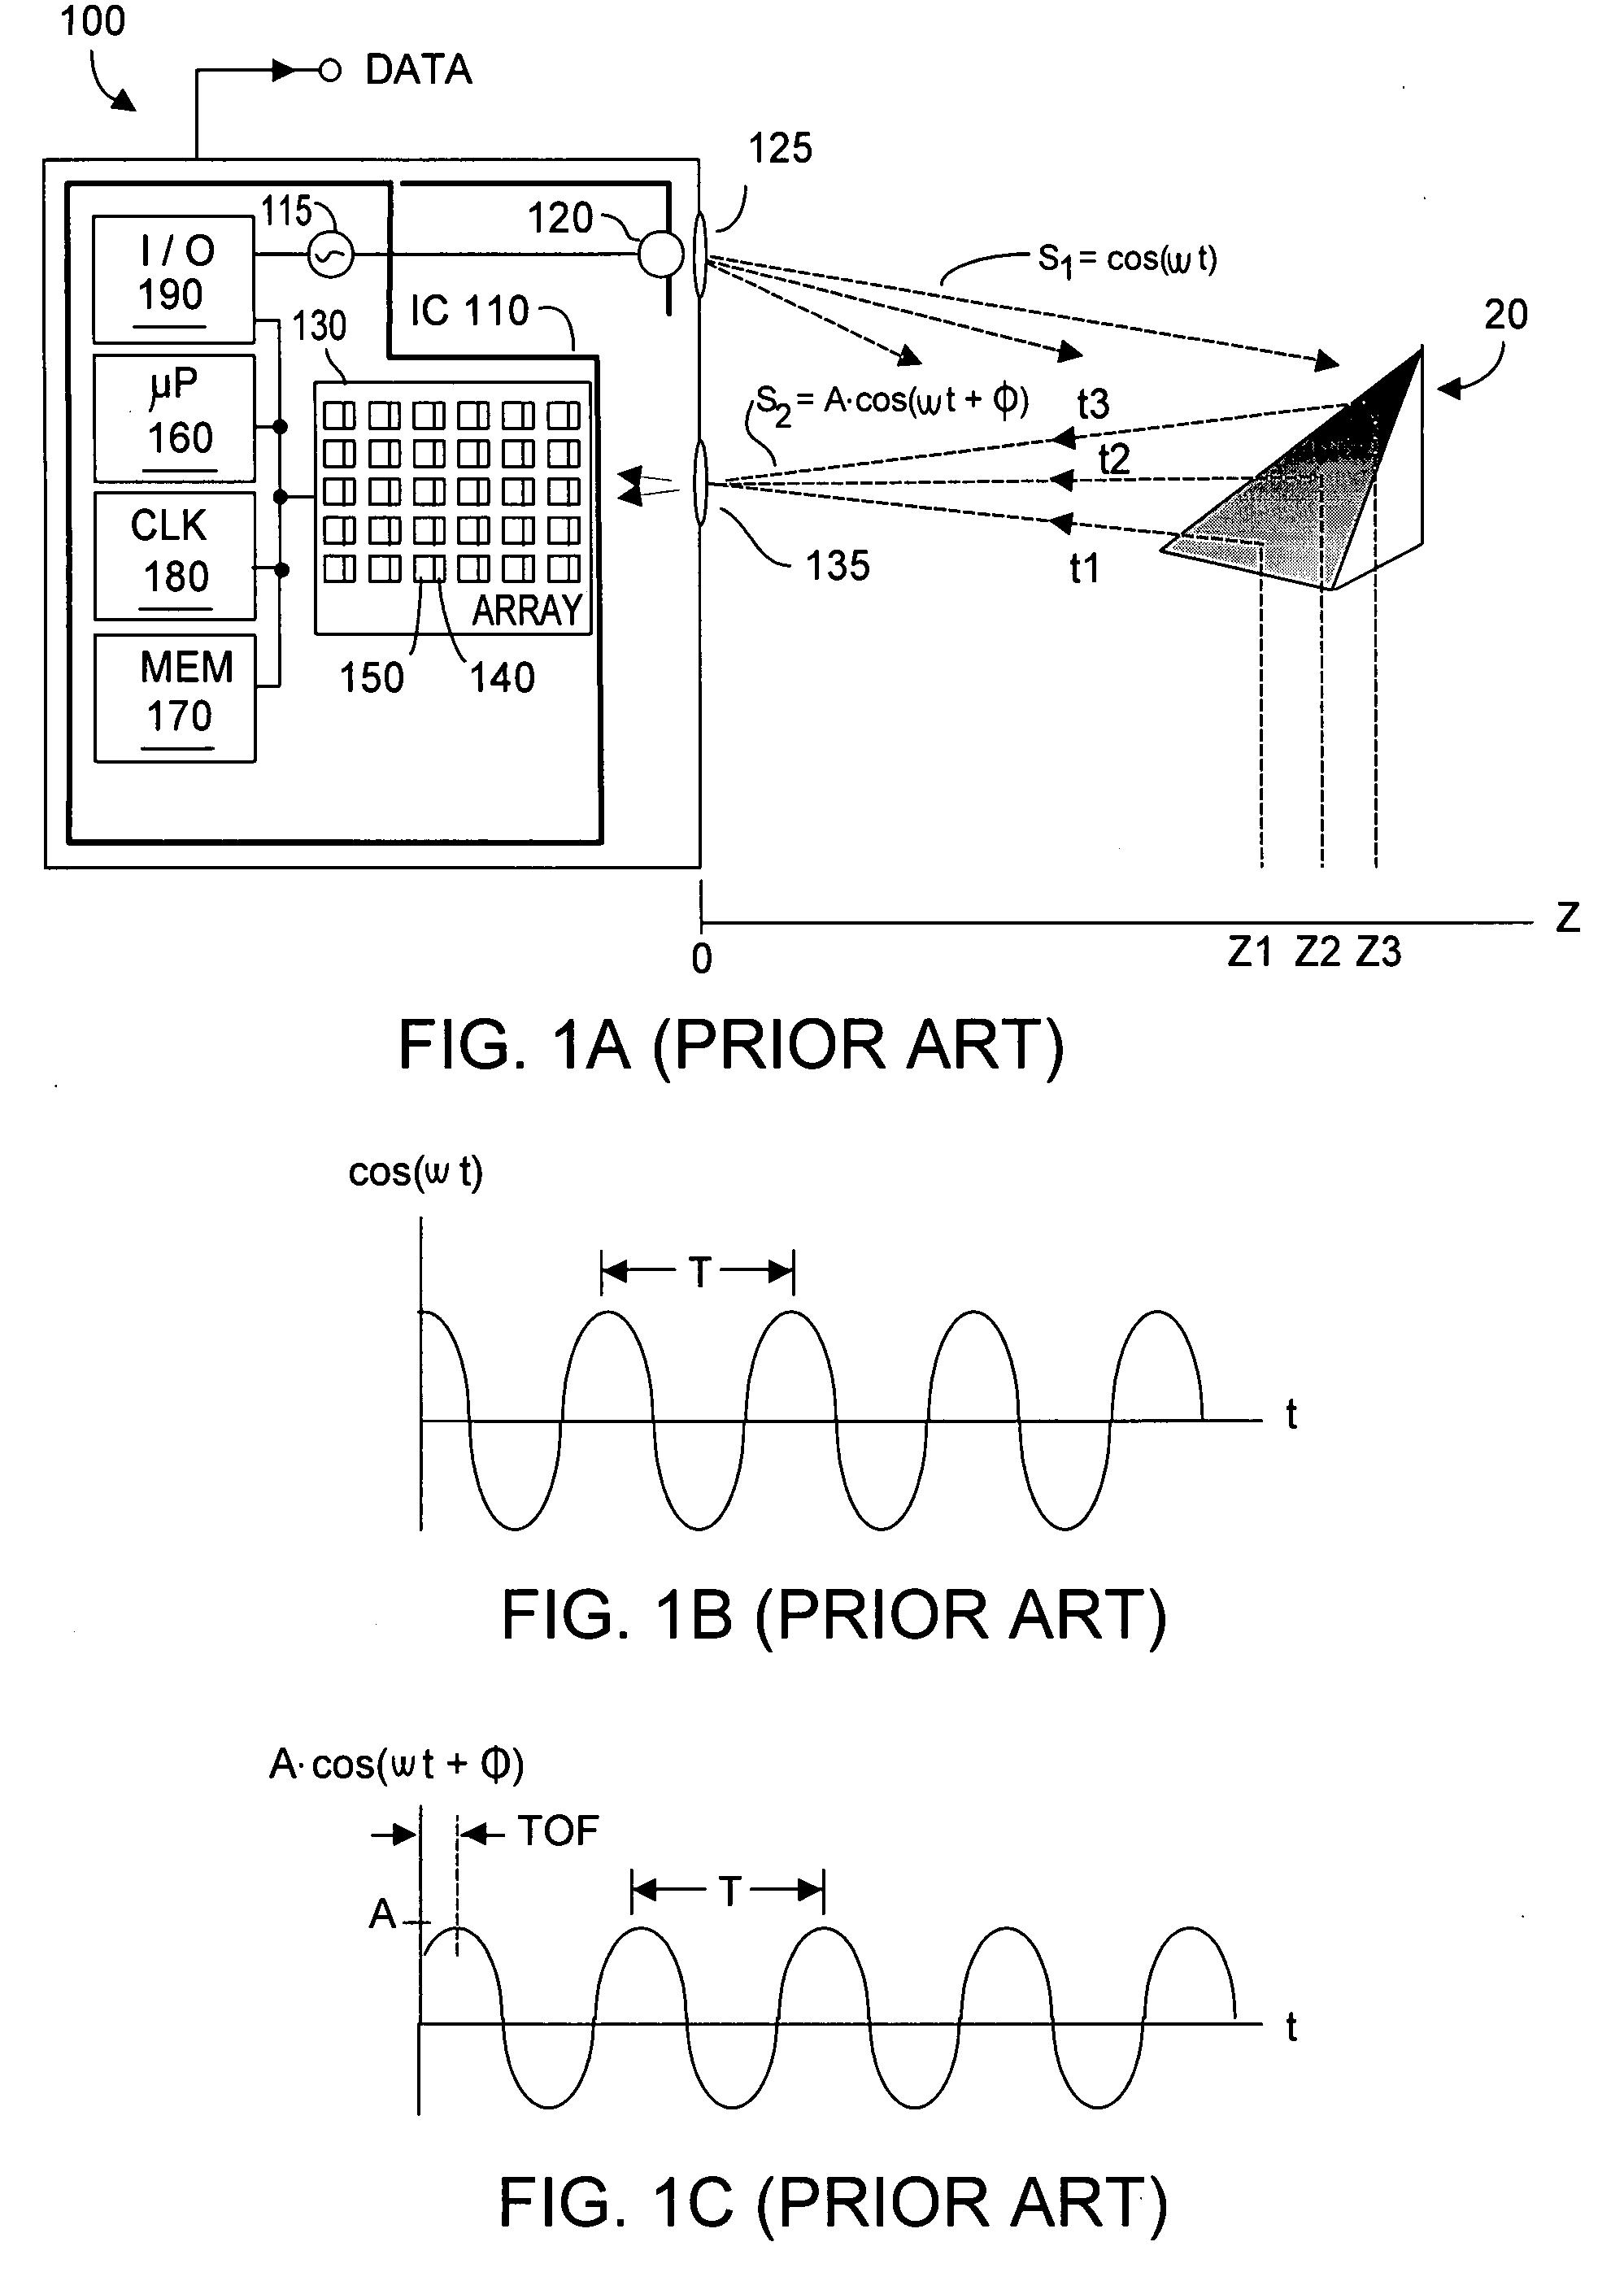 Servo Sweep Driver Circuit Diagram Tradeoficcom Fm Modulator Phaseshift Oscillator Wiring Patent Us7405812 Method And System To Avoid Inter